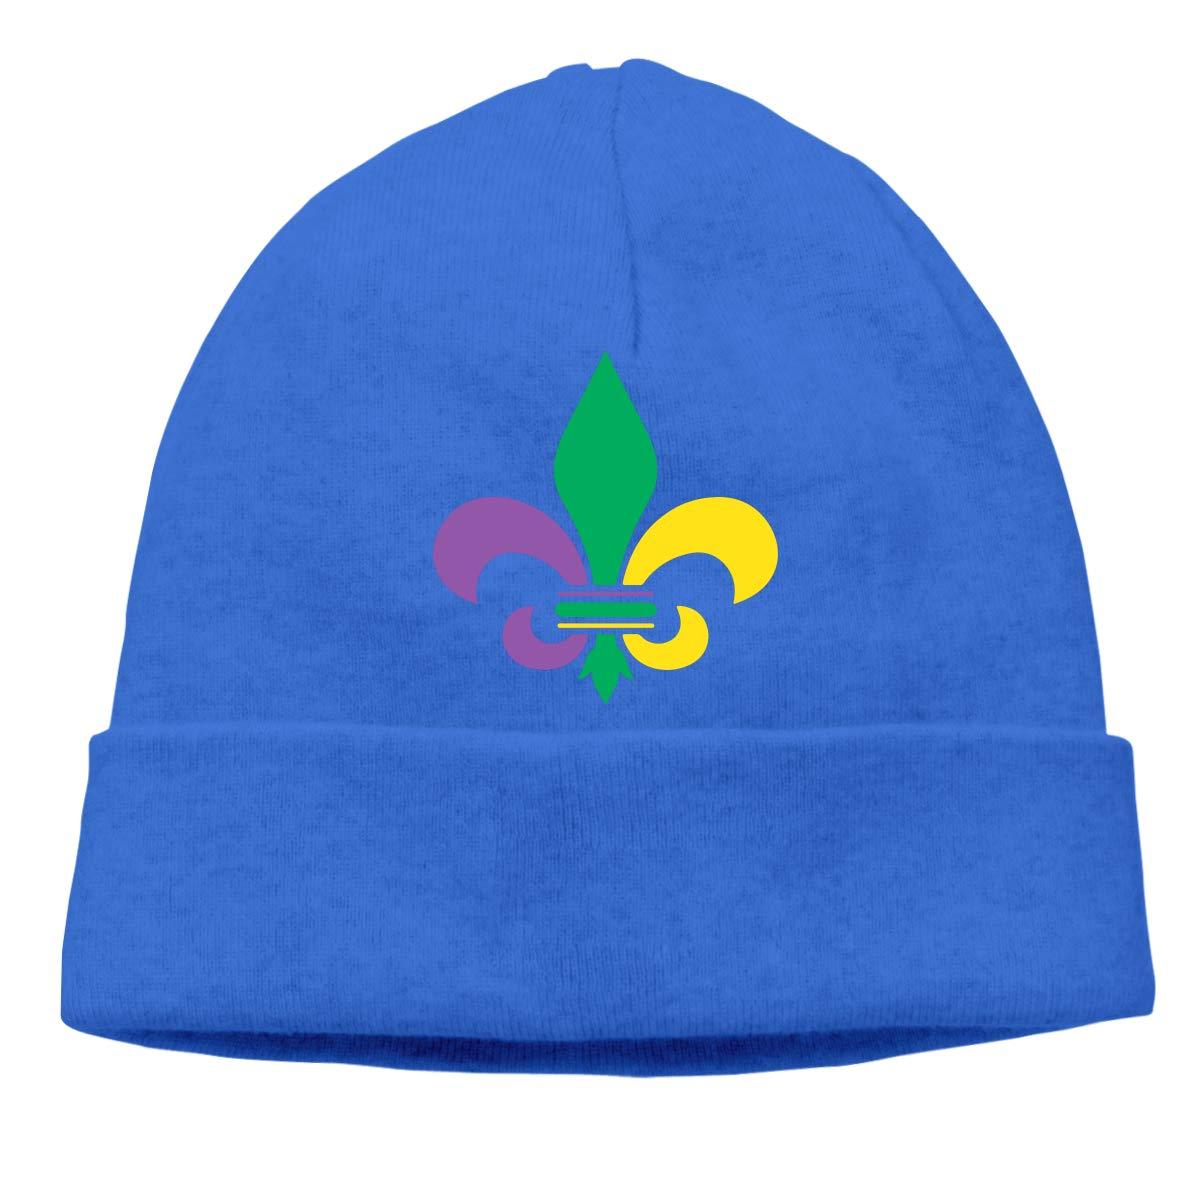 Beanie Hat Mardi Gras Fleur De Lis Warm Skull Caps for Men and Women